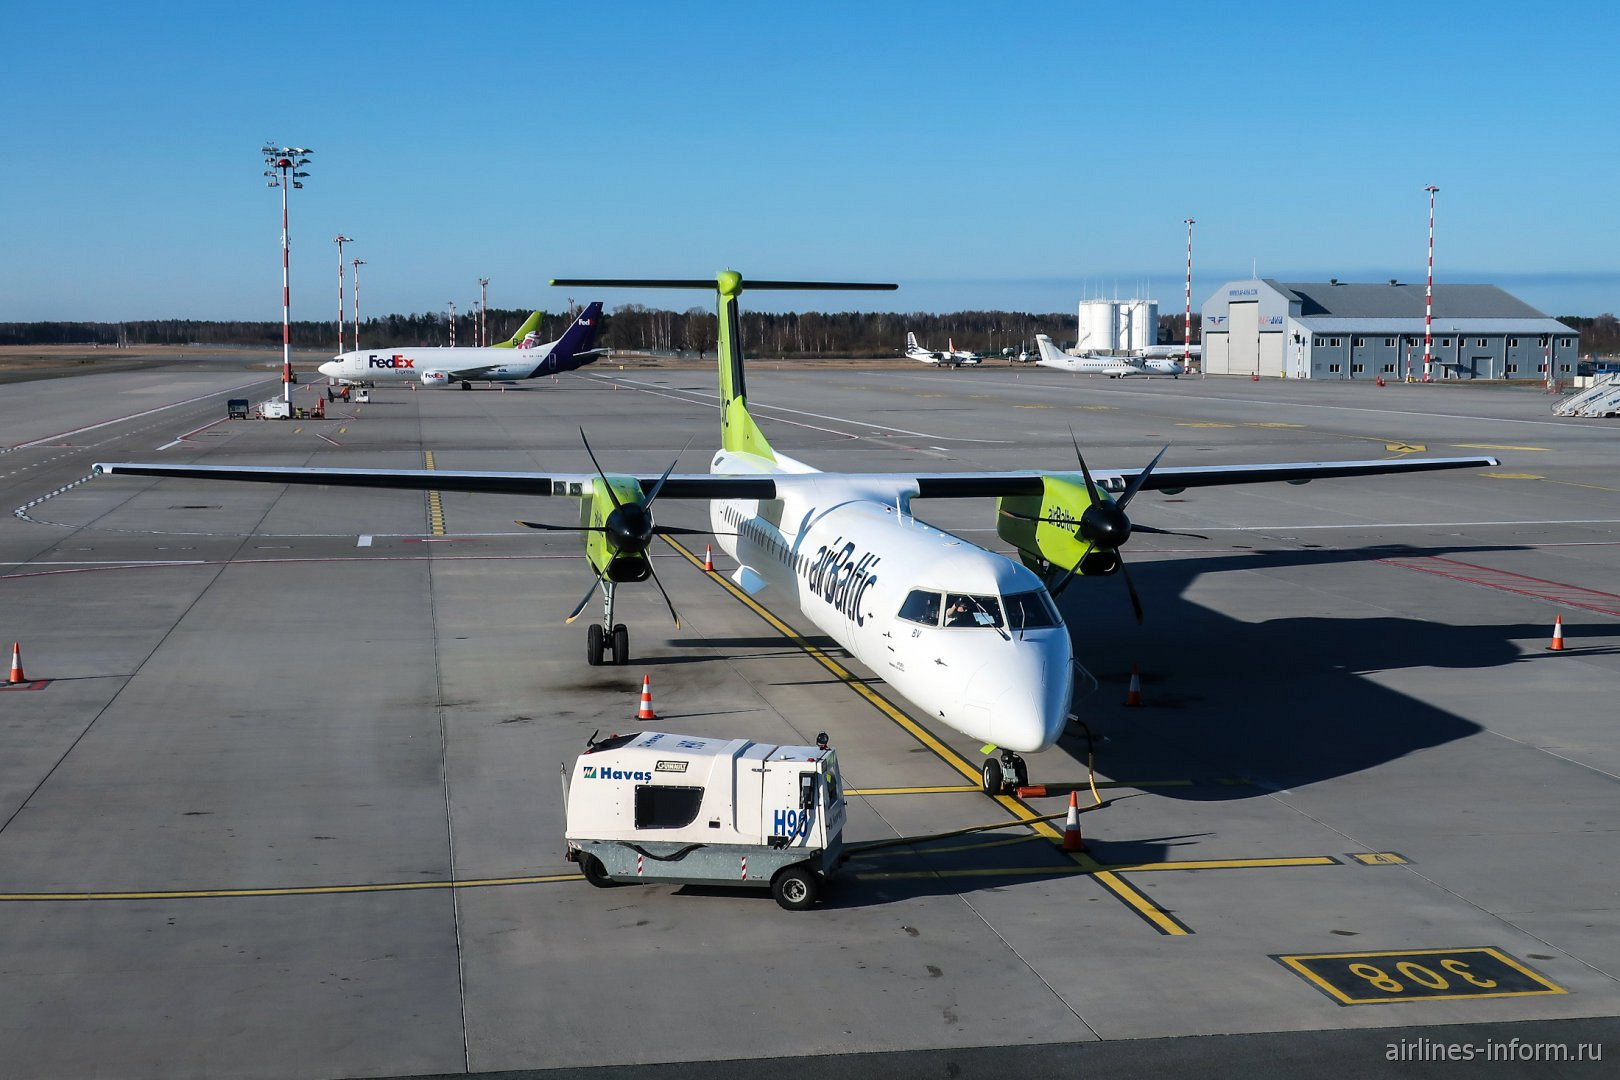 Самолет Bombardier Dash 8 Q400 авиакомпании airBaltic в аэропорту Рига